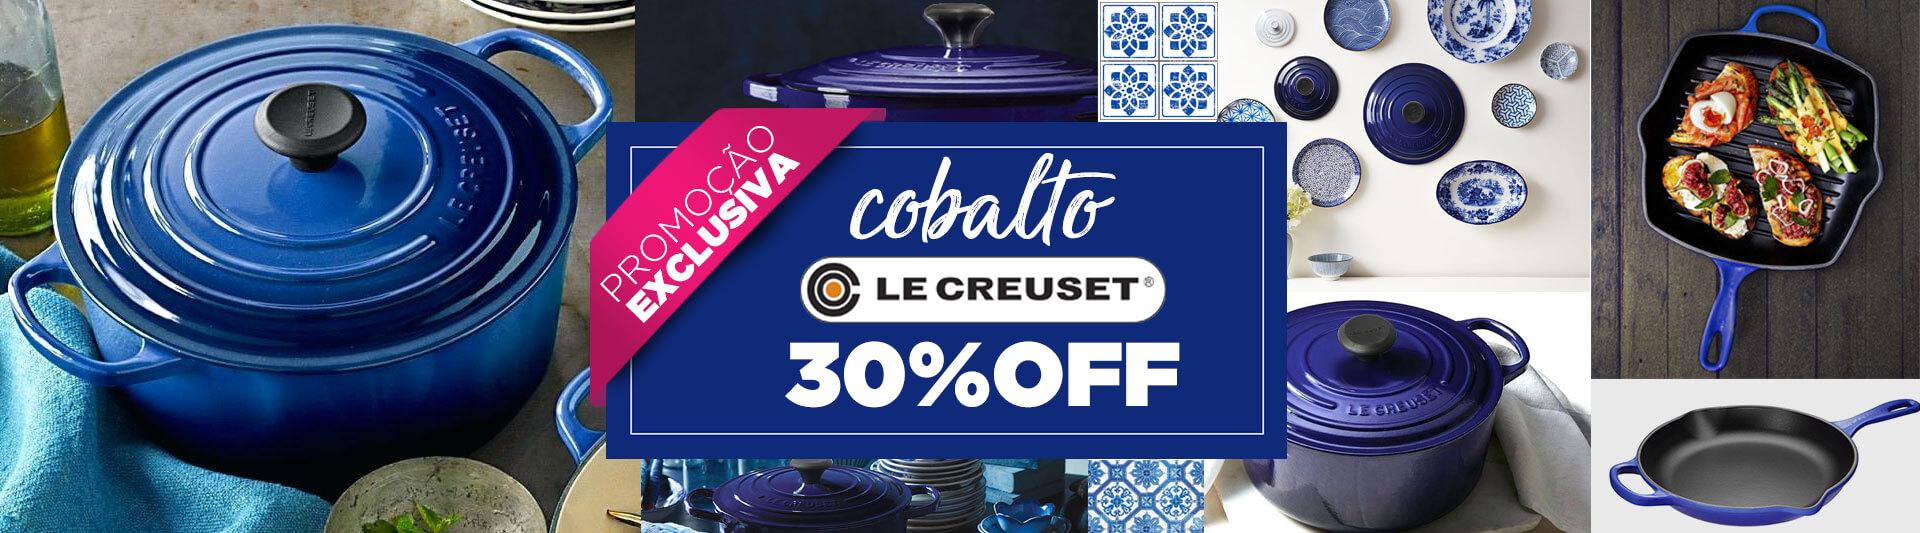 Cobalto Le Creuset - Desk